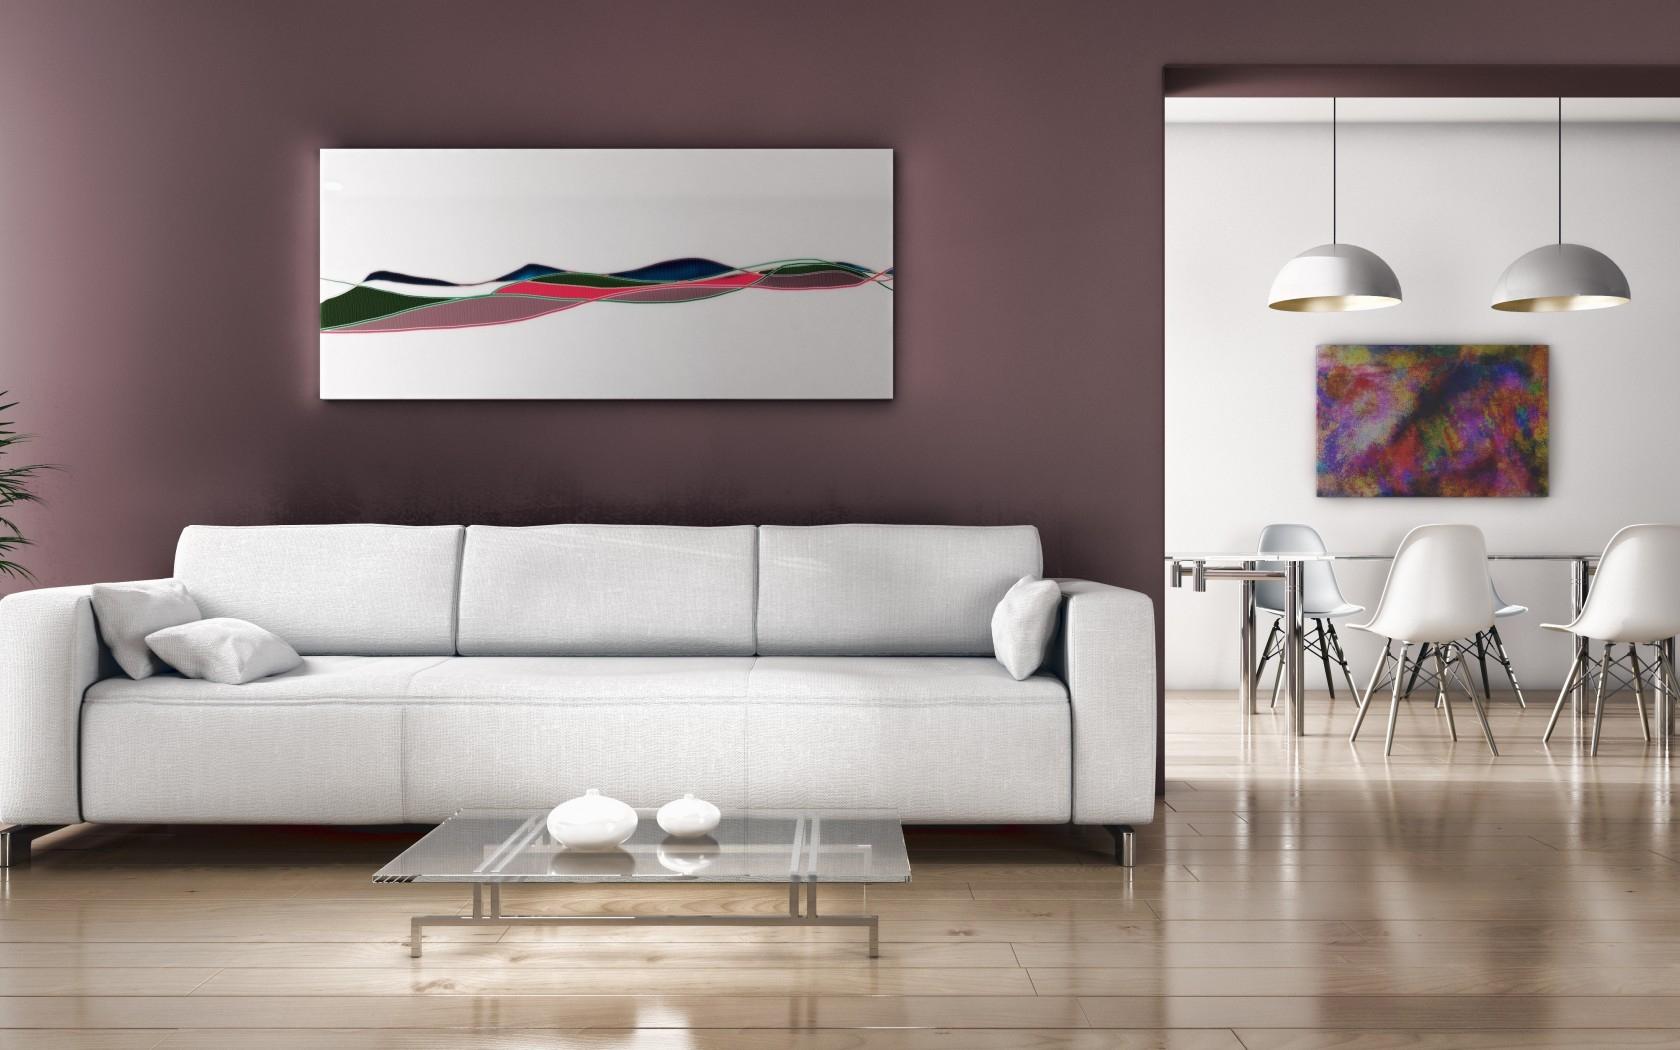 fond d 39 cran blanc chambre mur table vases canap design d 39 int rieur chaises. Black Bedroom Furniture Sets. Home Design Ideas